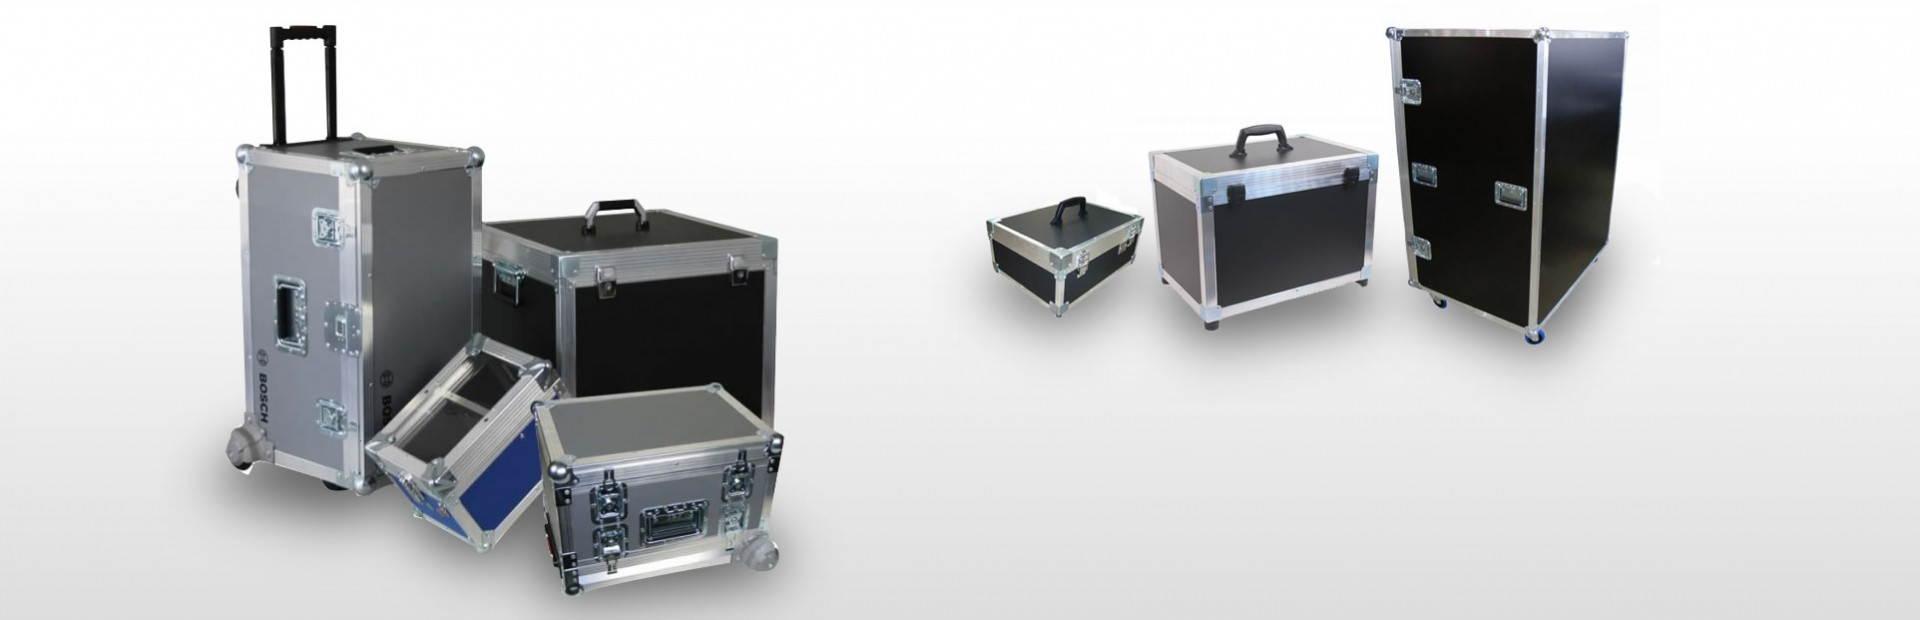 transportkisten aus aluminium nach ma. Black Bedroom Furniture Sets. Home Design Ideas